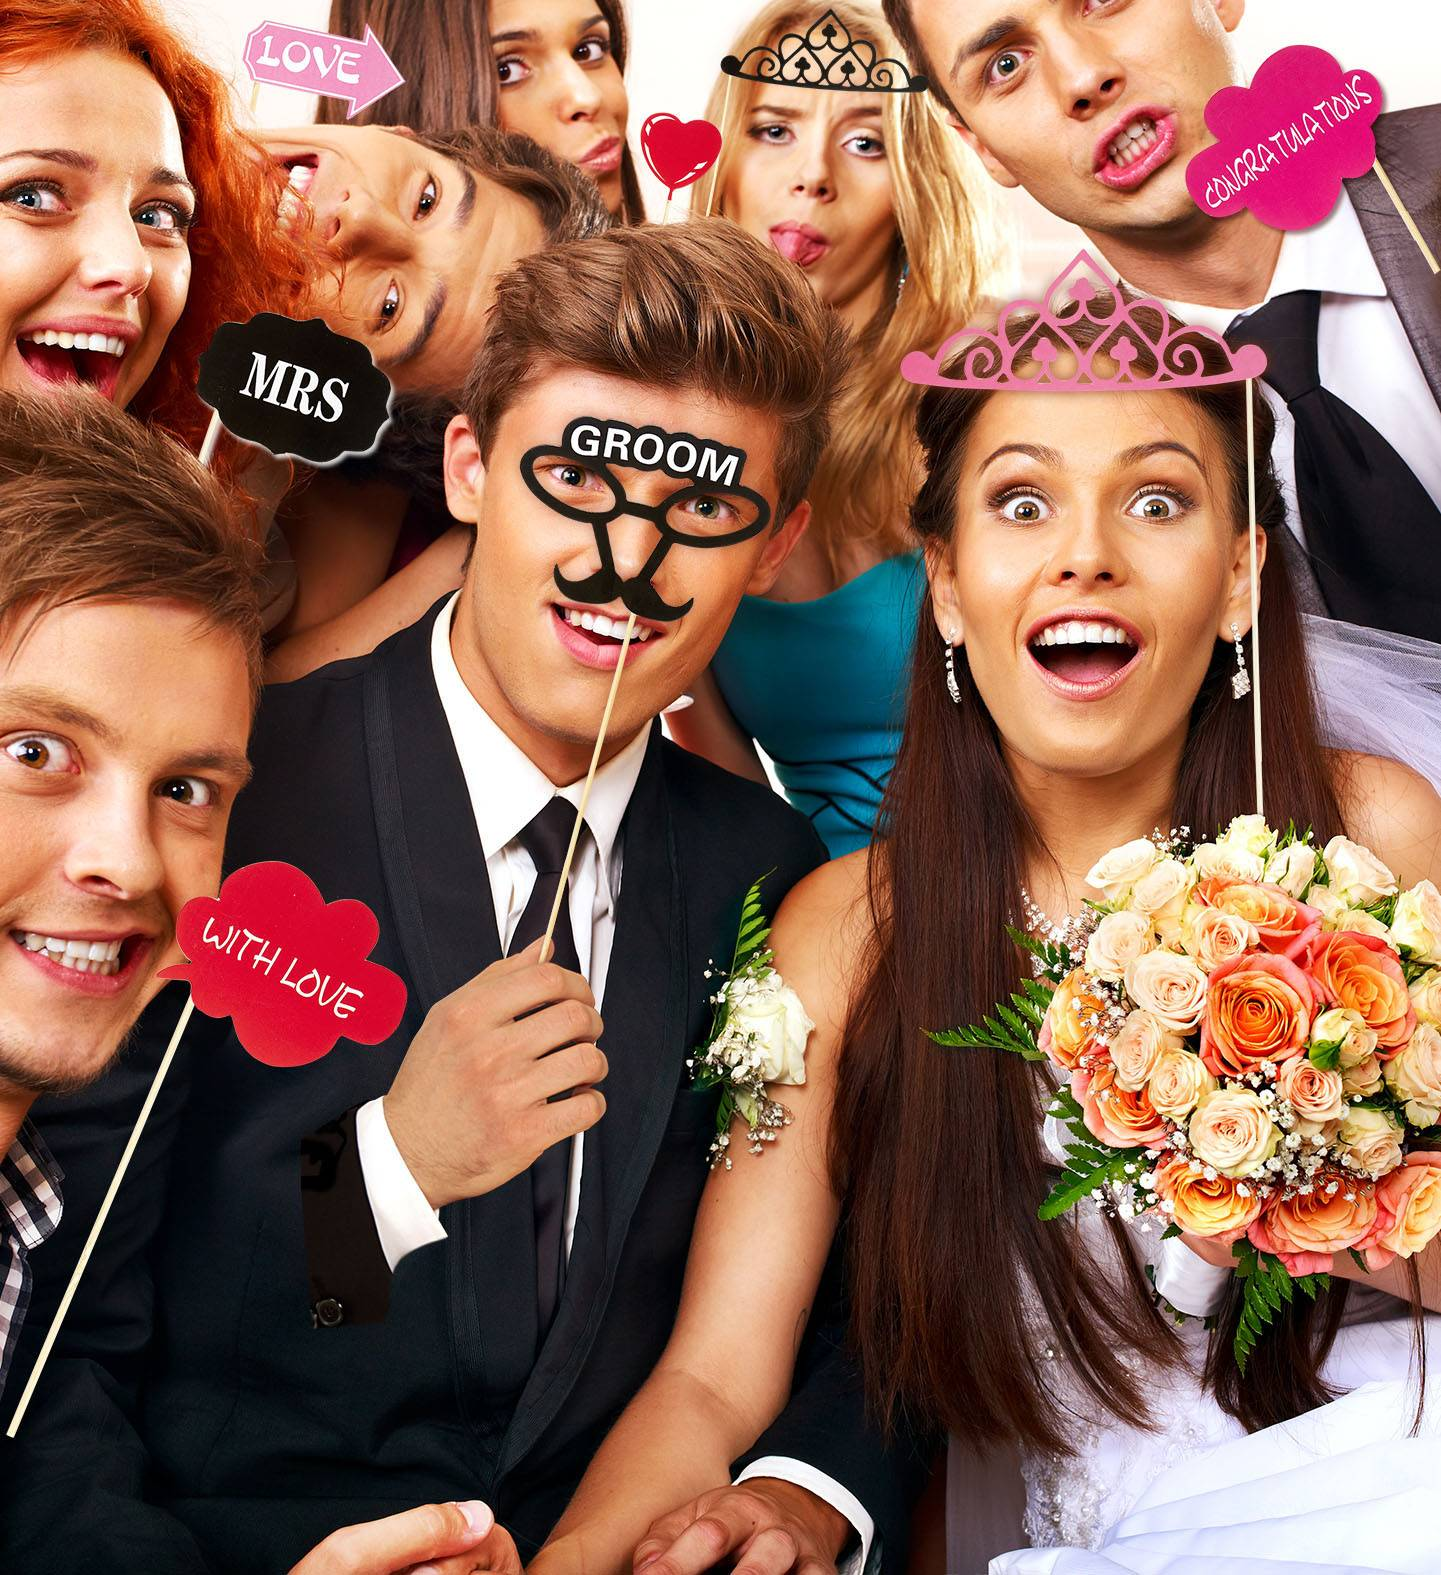 WIDMANN S.R.L. 20 Selfie Stick Sposo E Sposa E Tutti Gli Amici